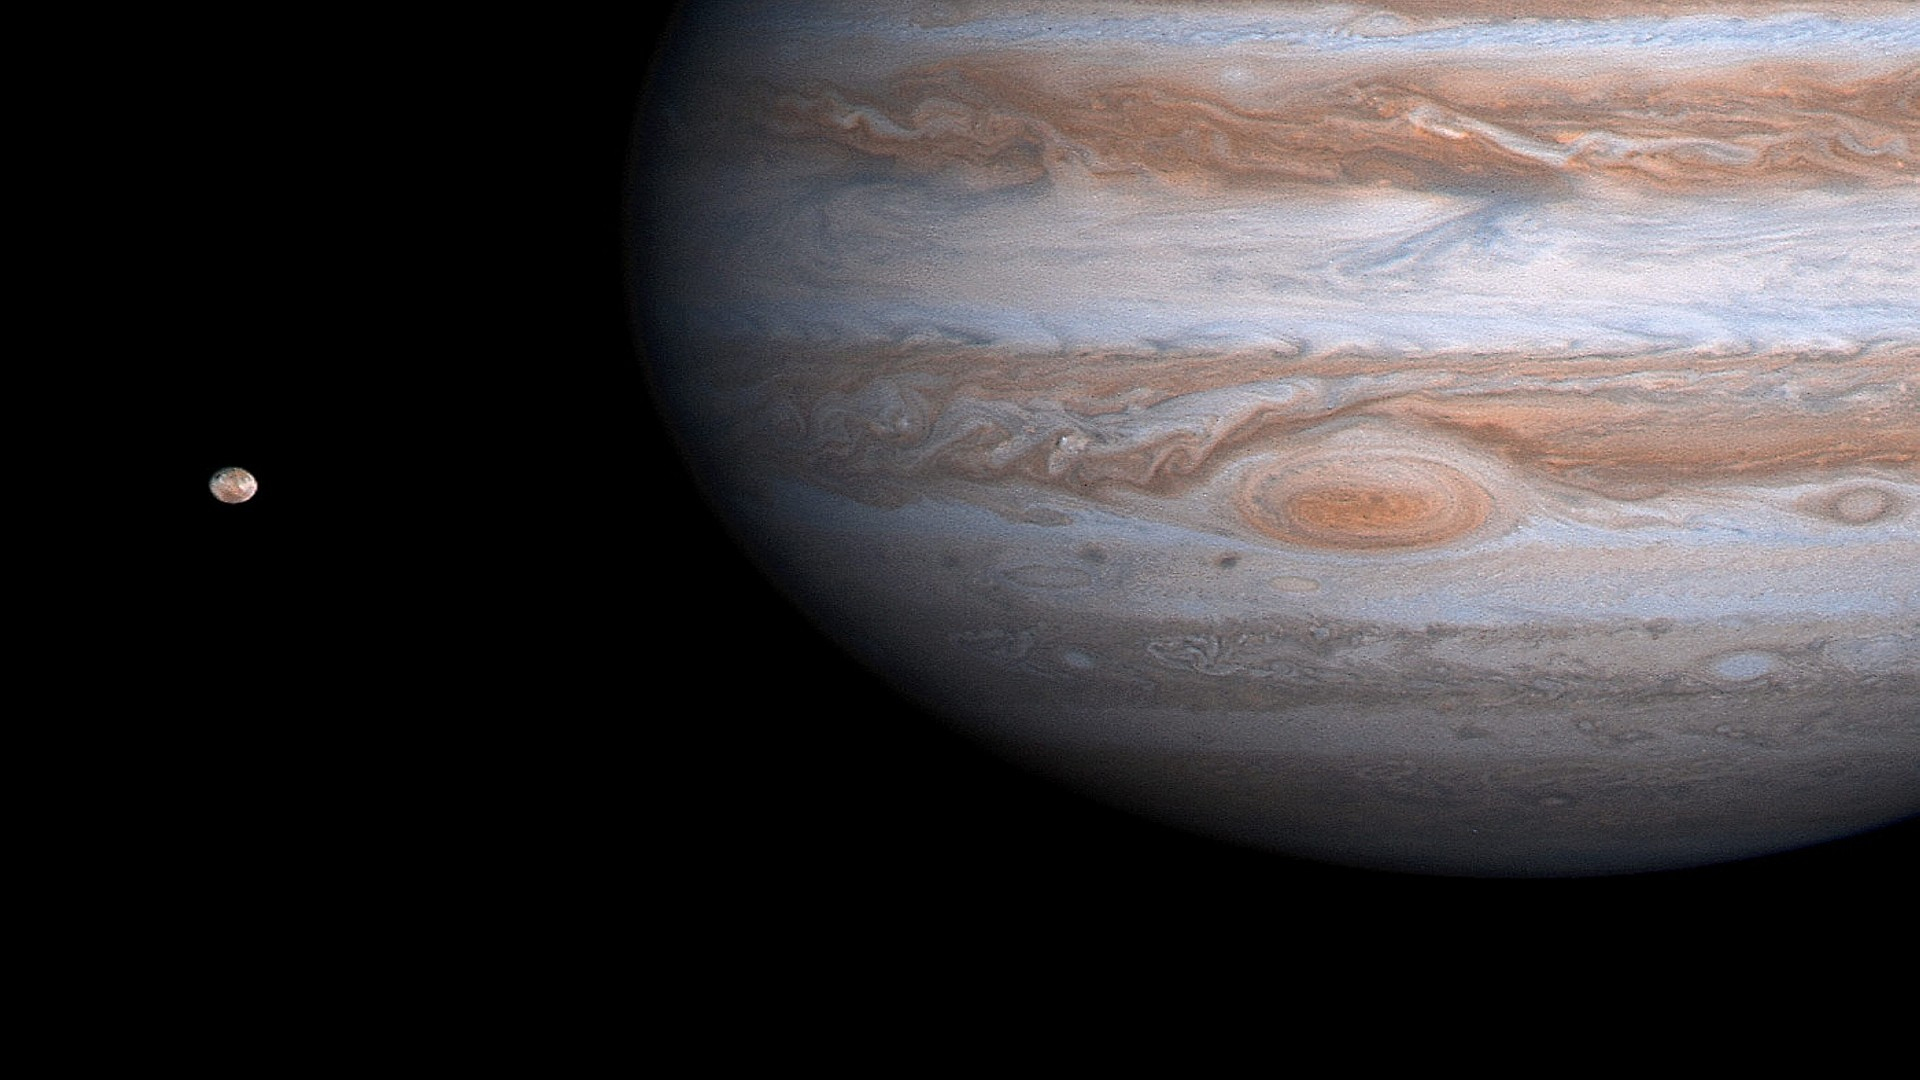 фото на обои планета юпитер утверждают